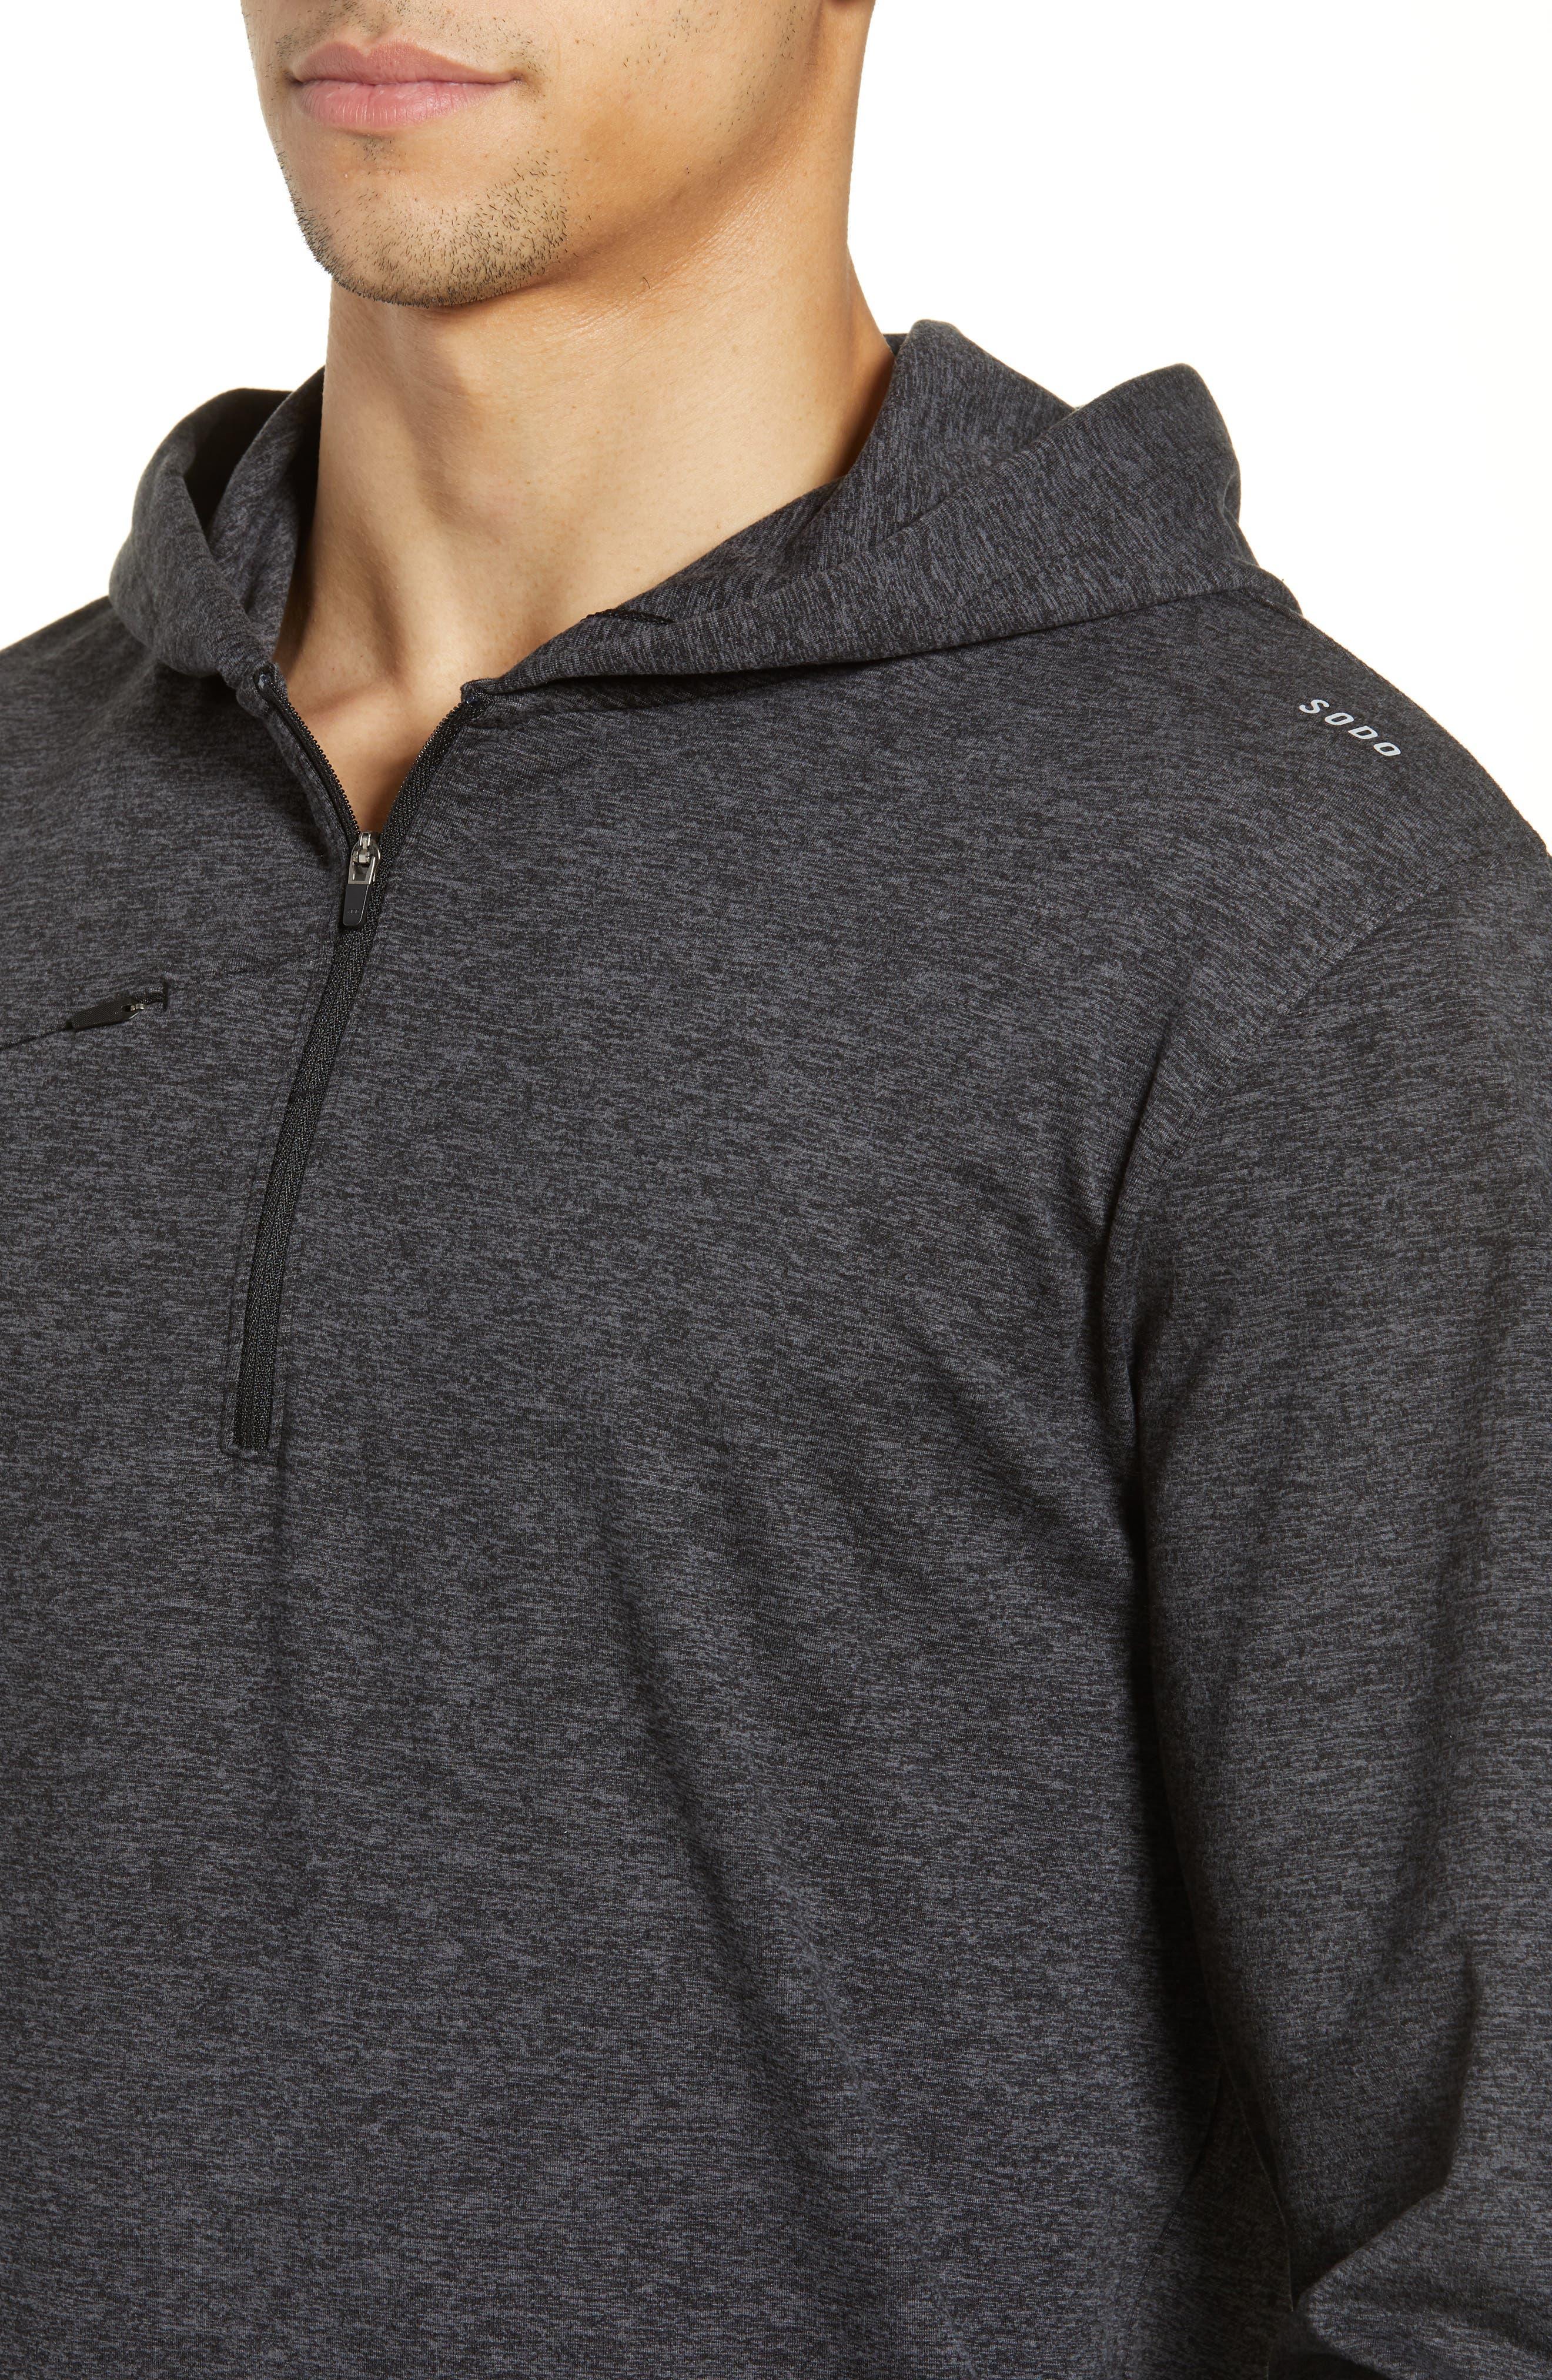 SODO, Elevate Hooded Sweatshirt, Alternate thumbnail 4, color, HEATHER CHARCOAL BLACK/ BLACK